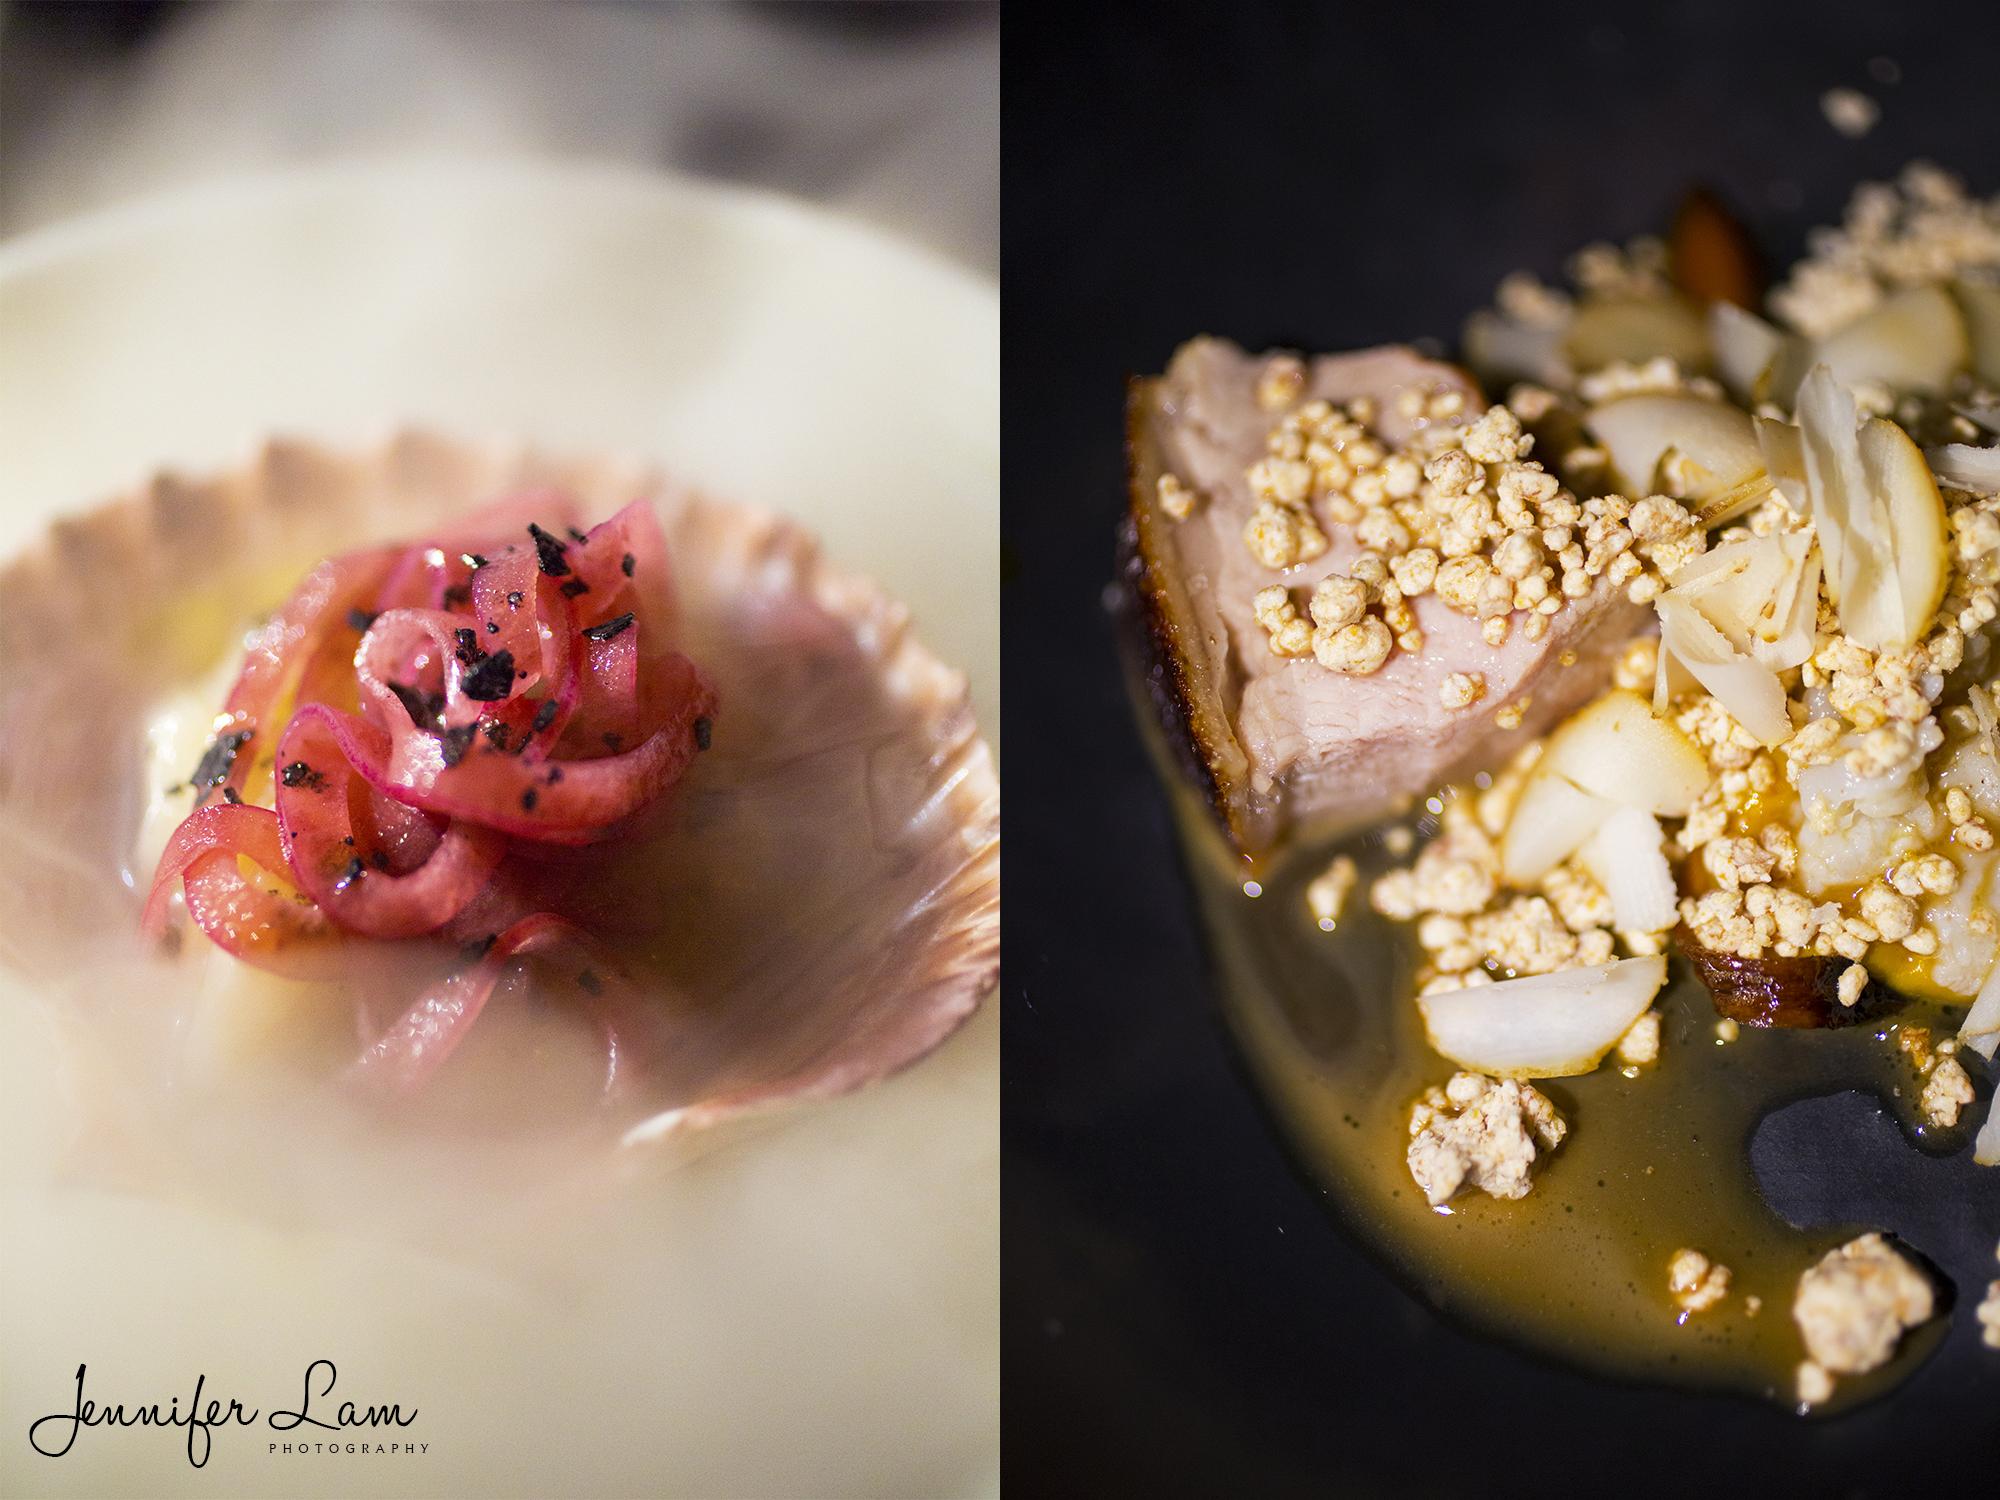 Sydney Food Photographer - Jennifer Lam Photography (4a).jpg